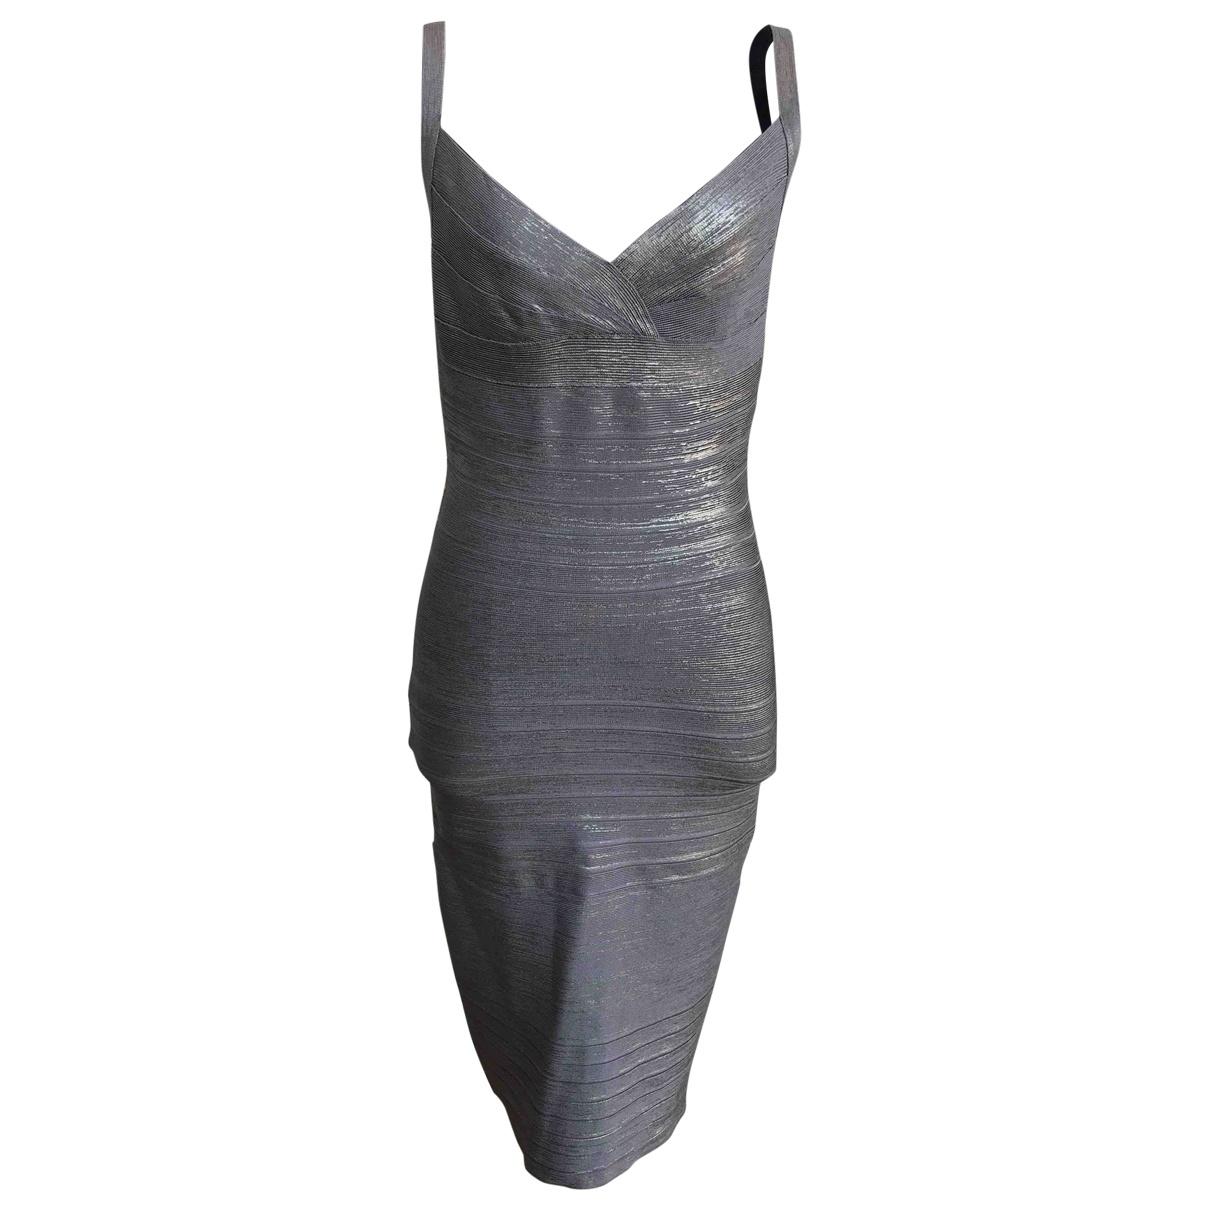 Herve Leger \N Brown dress for Women S International